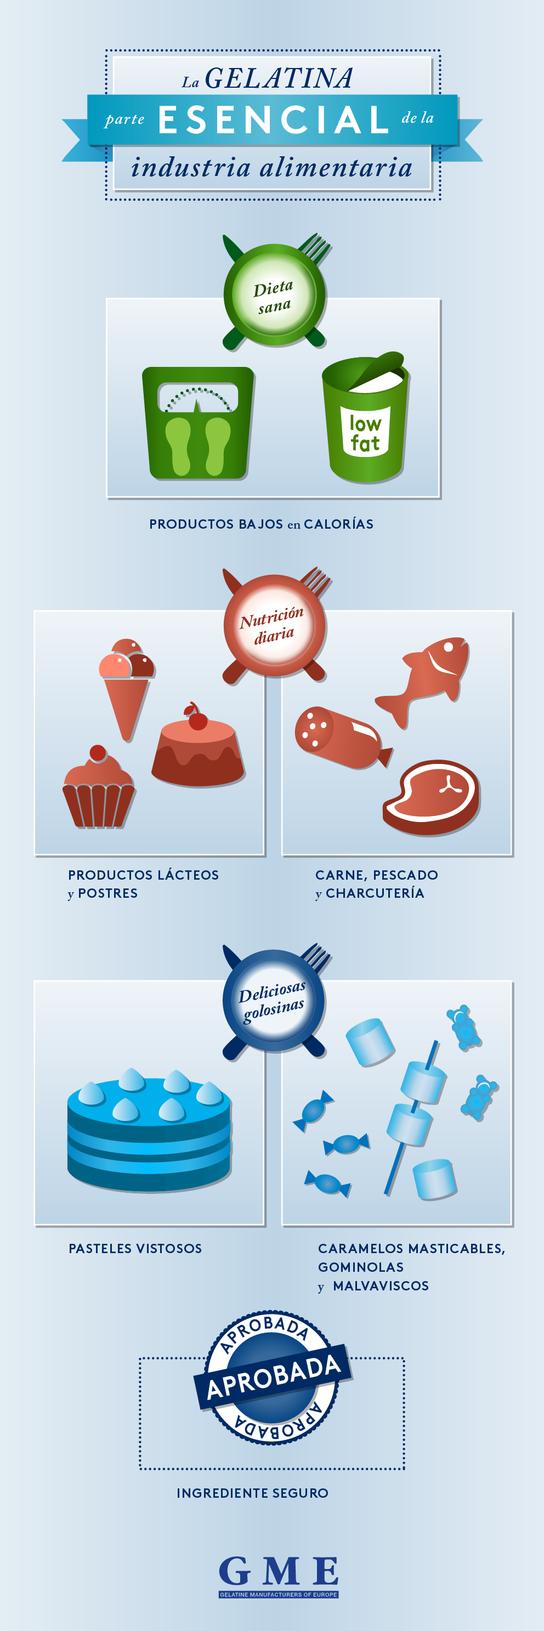 Food Applications